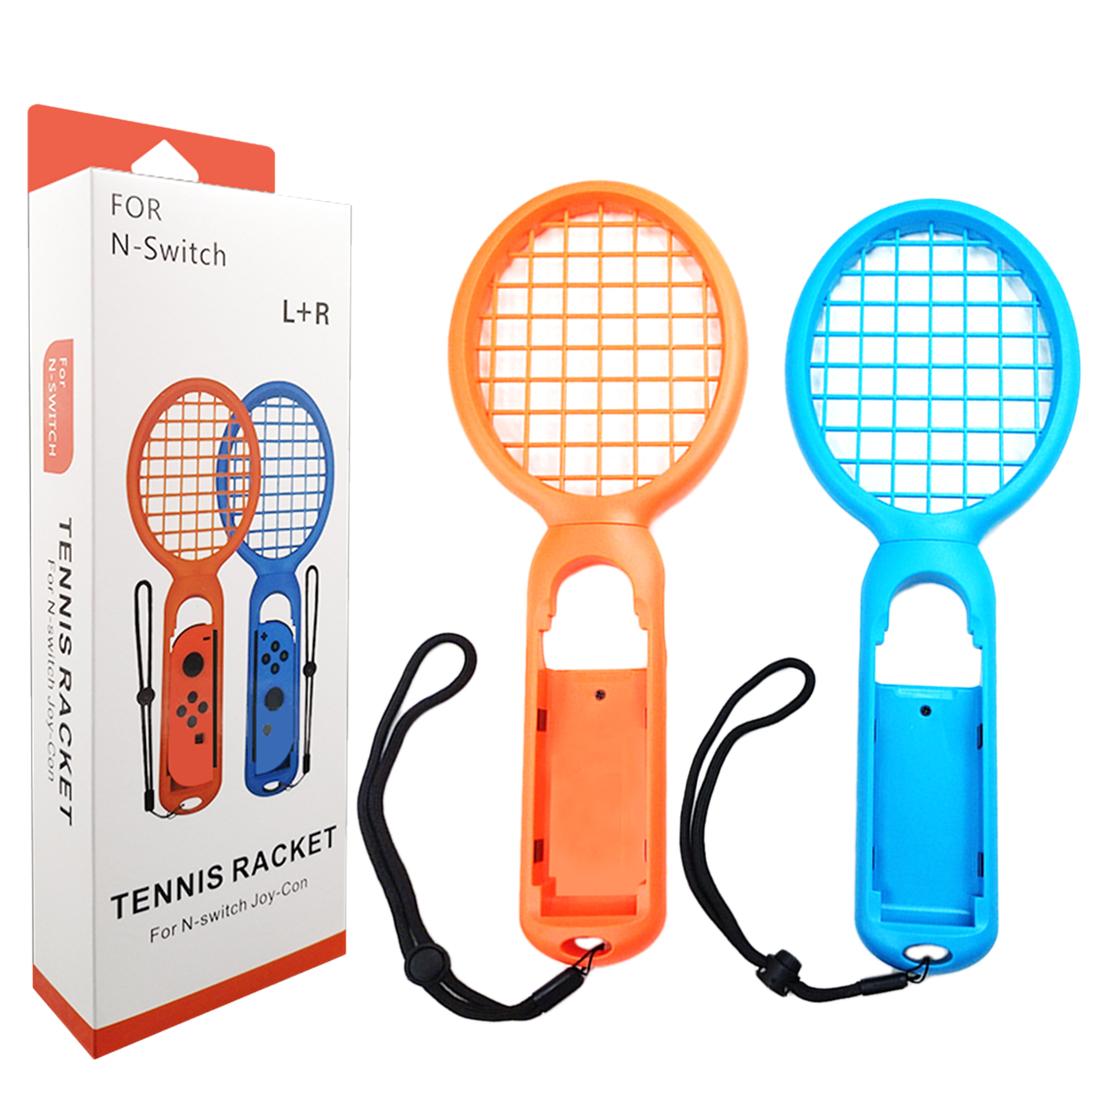 Tennis Racket for Nintendo Switch Motion Sensing Game Mario Tennis Aces Game